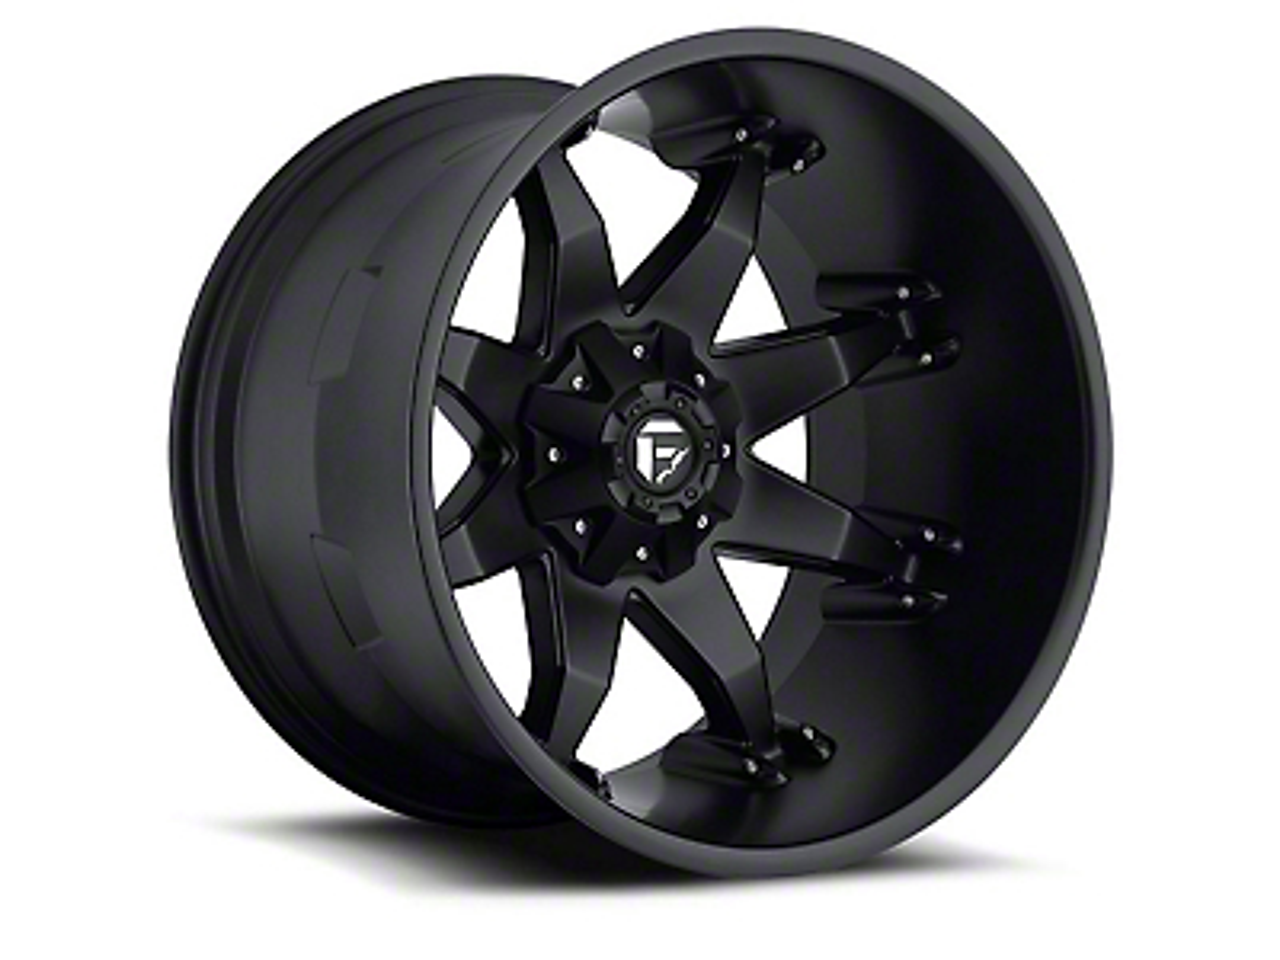 Fuel Wheels Octane Matte Black 5-Lug Wheel - 20x12 (02-18 RAM 1500, Excluding Mega Cab)